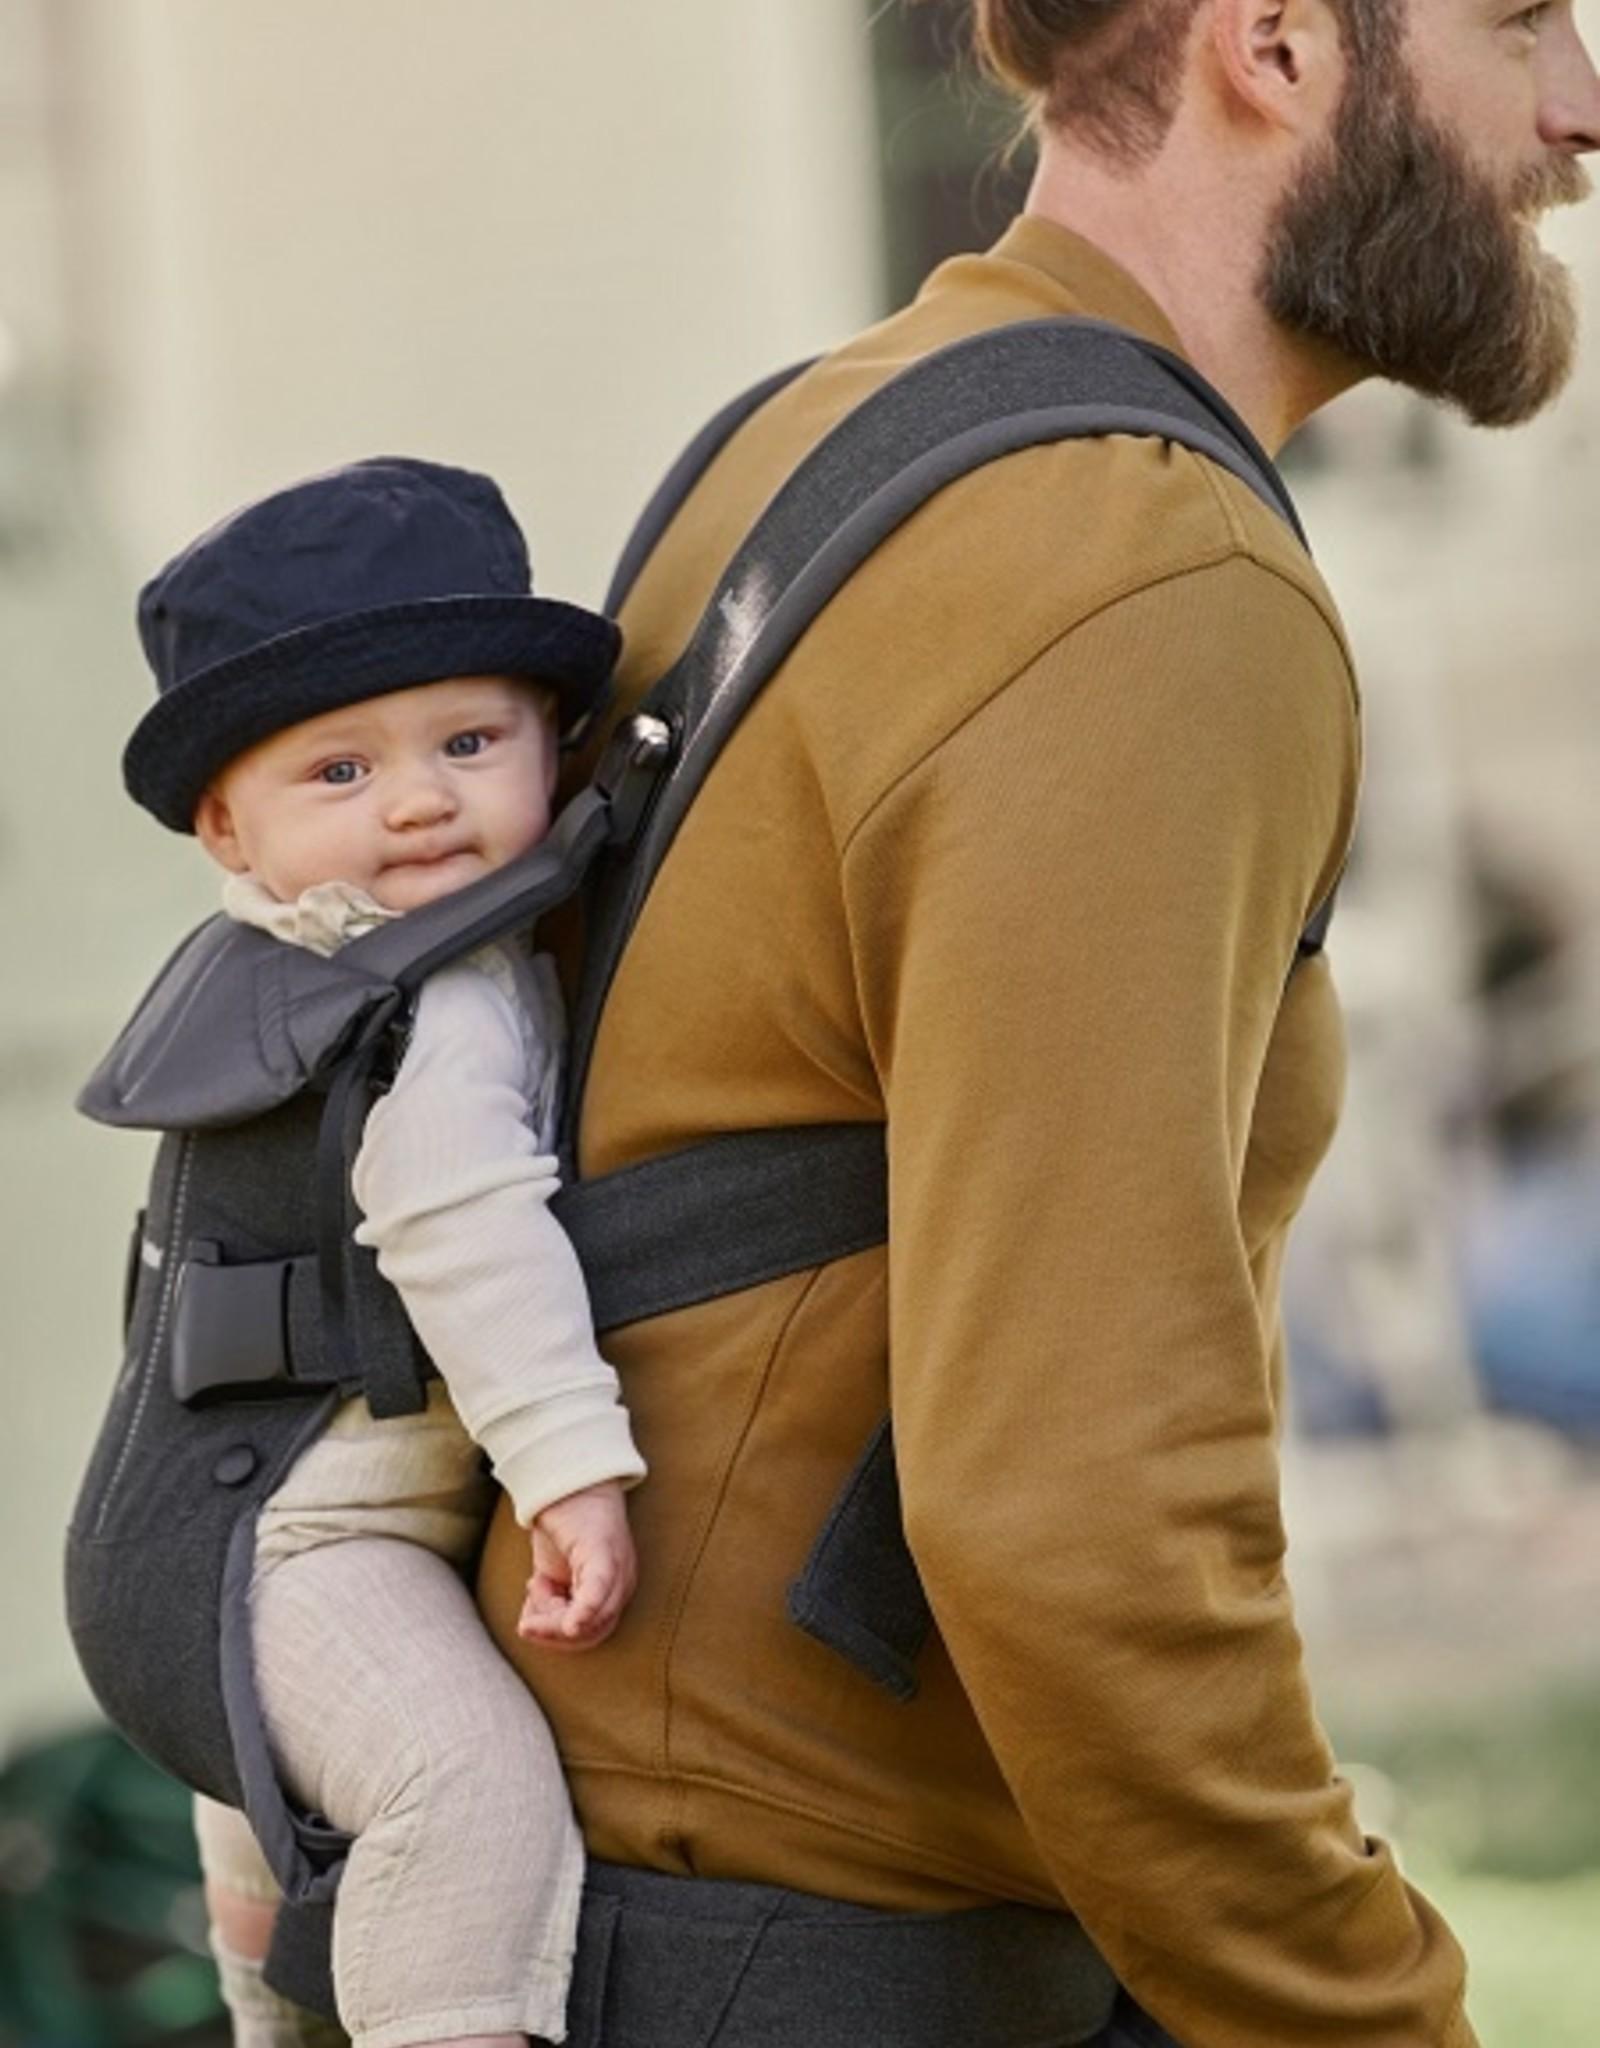 Babybjorn Baby carrier ONE cotton mix grijs denim